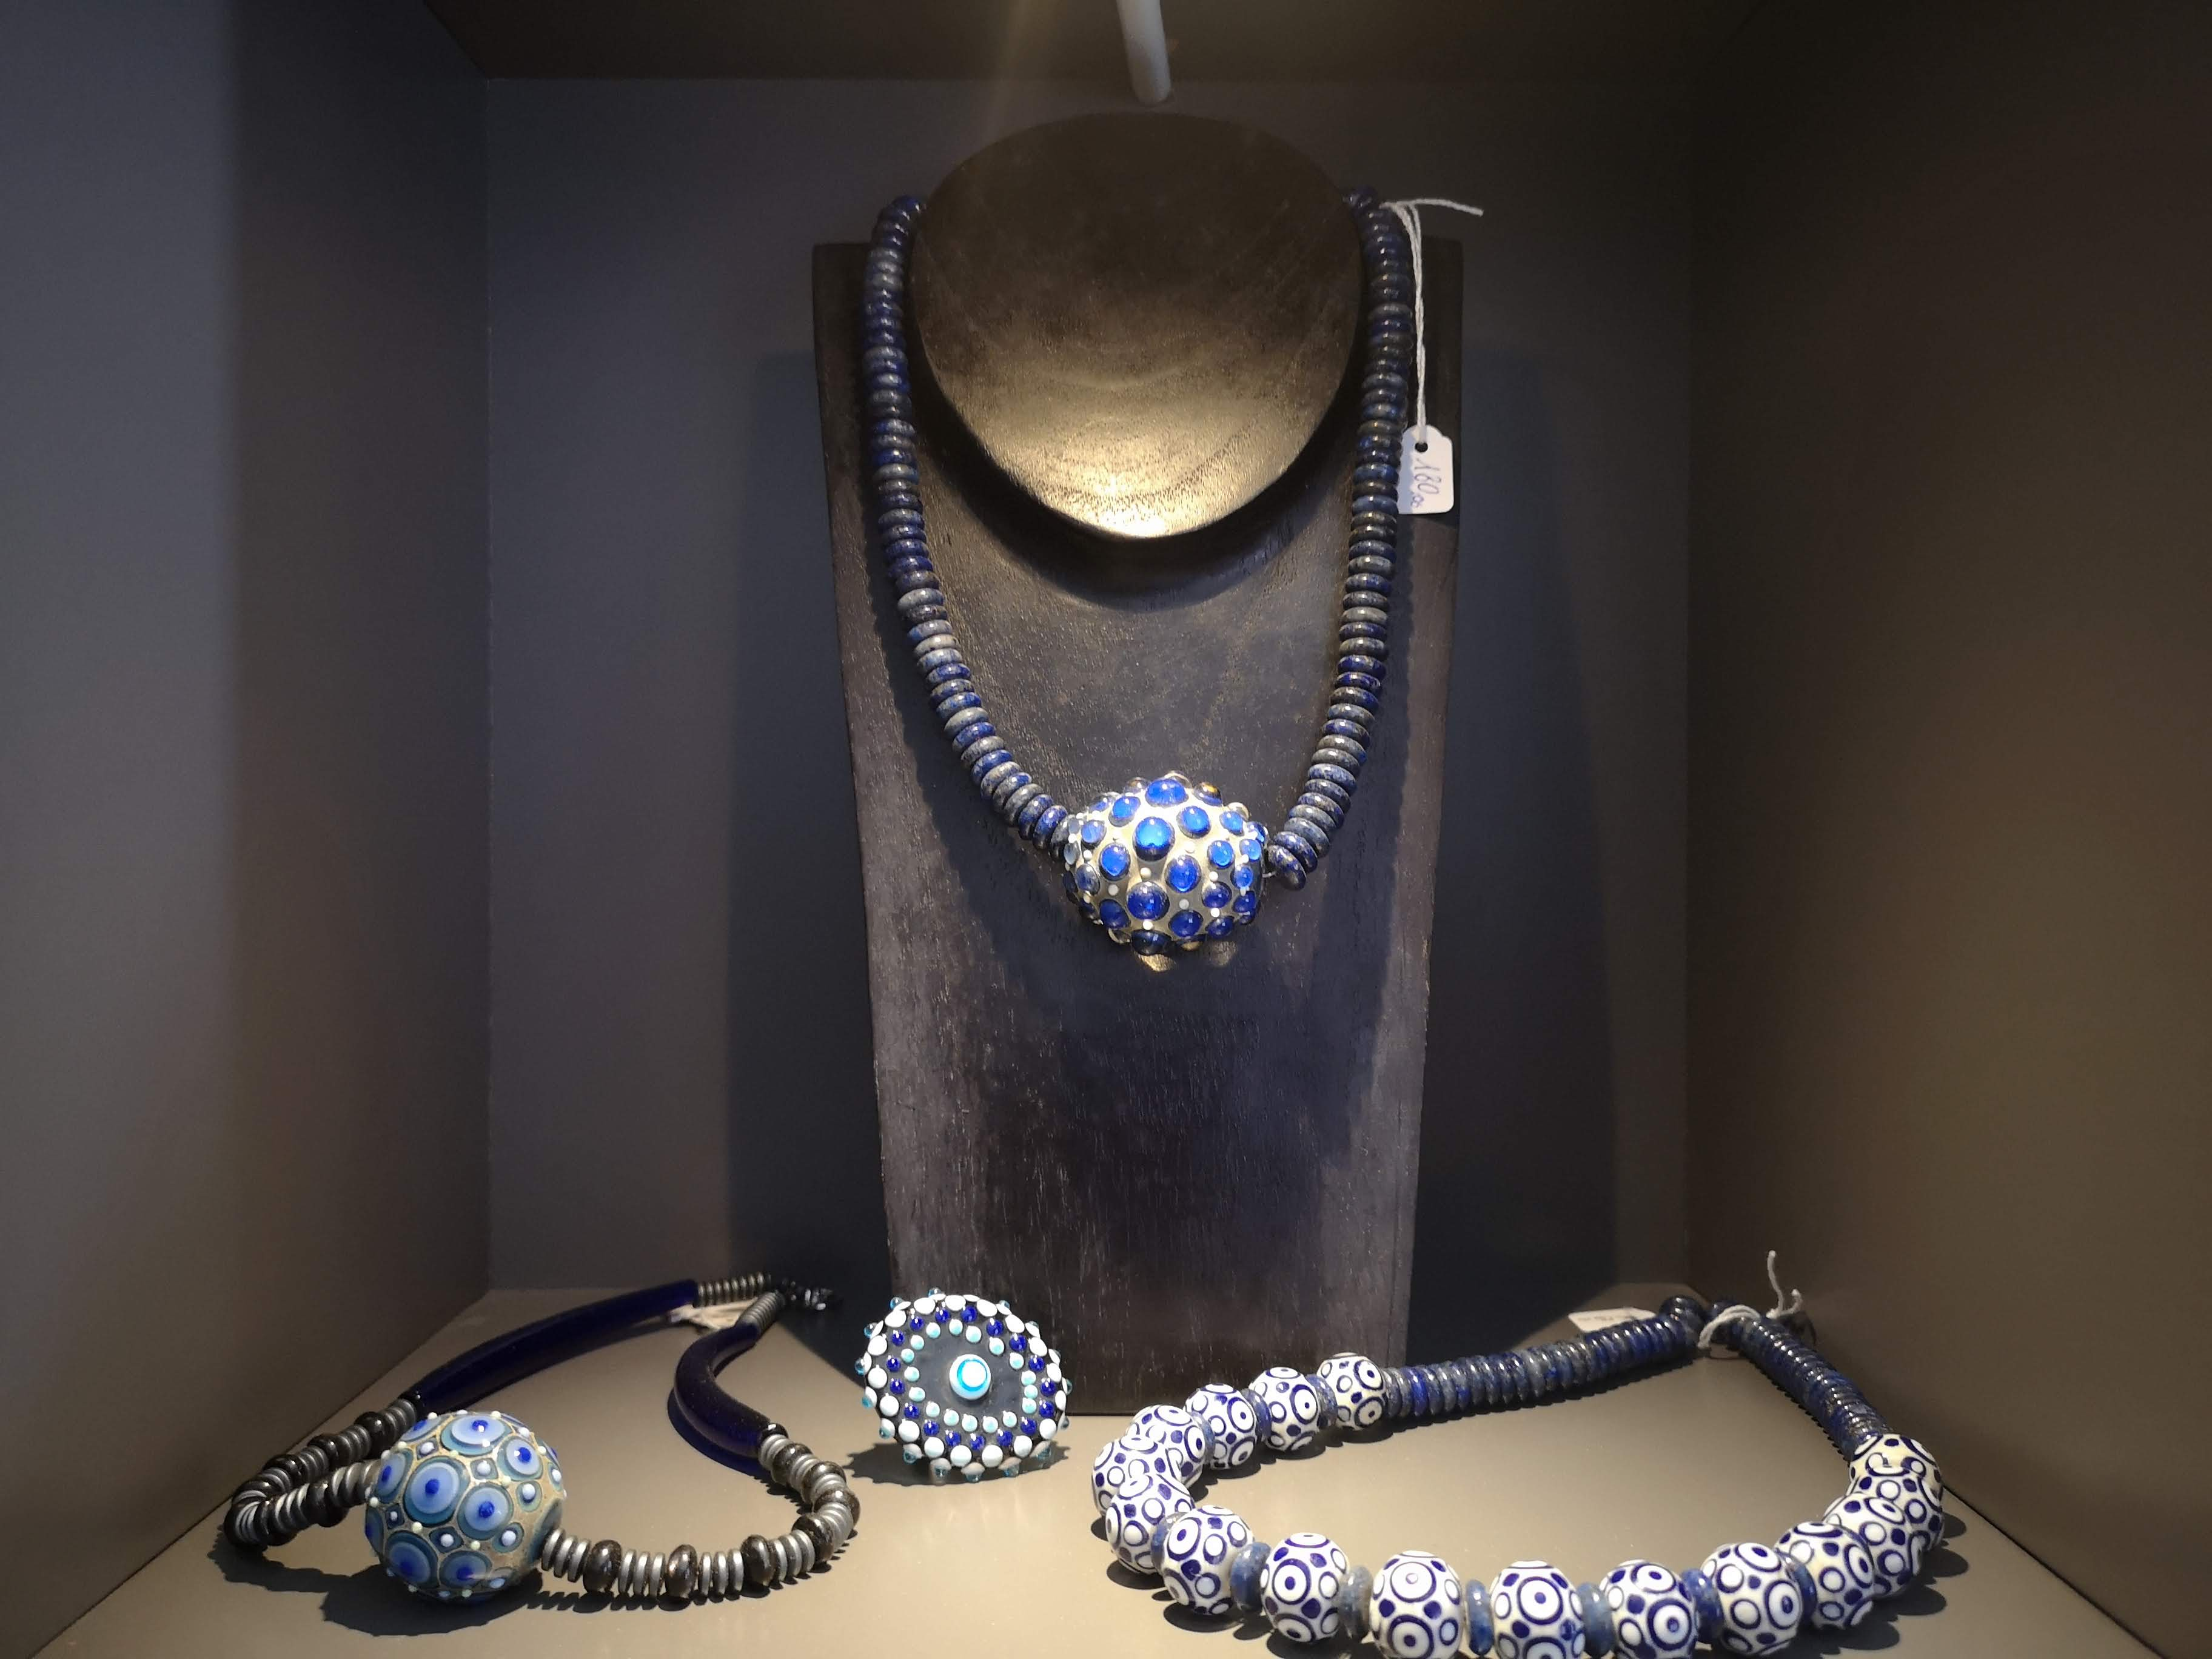 alessia fuga beads in murano